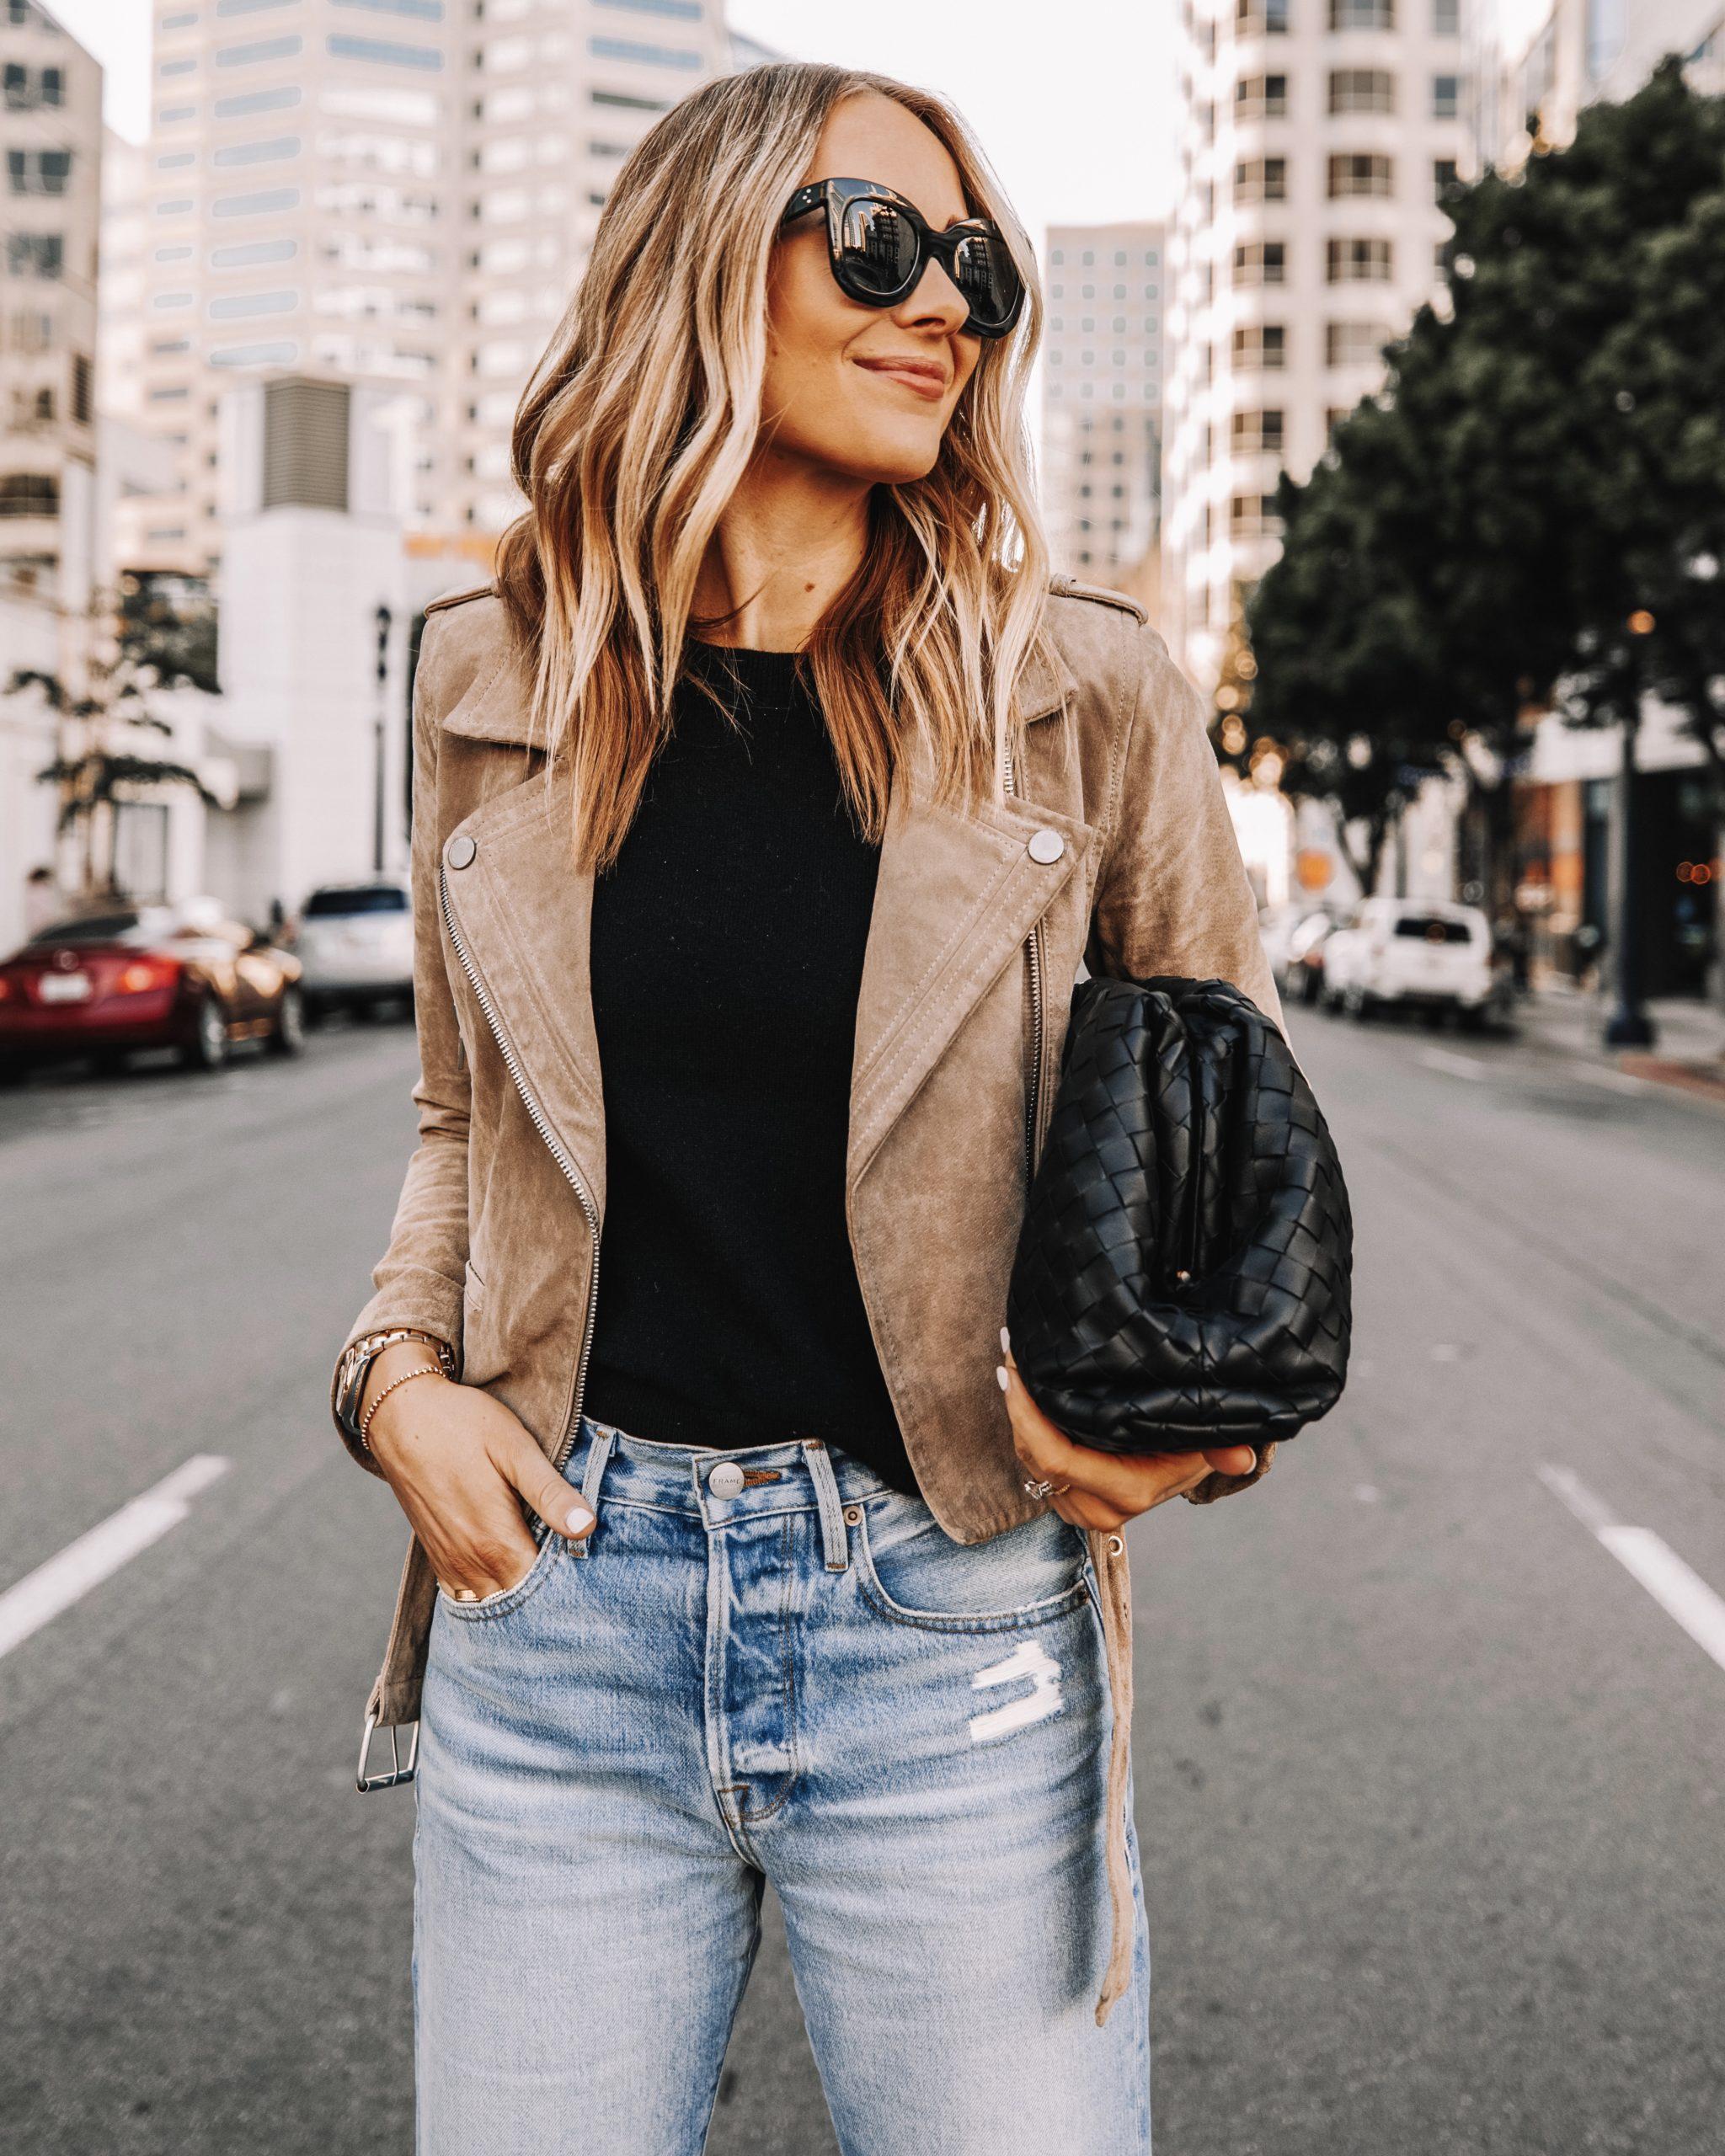 Fashion Jackson Wearing Blanknyc Suede Moto Jacket Bottega Veneta Black Clutch